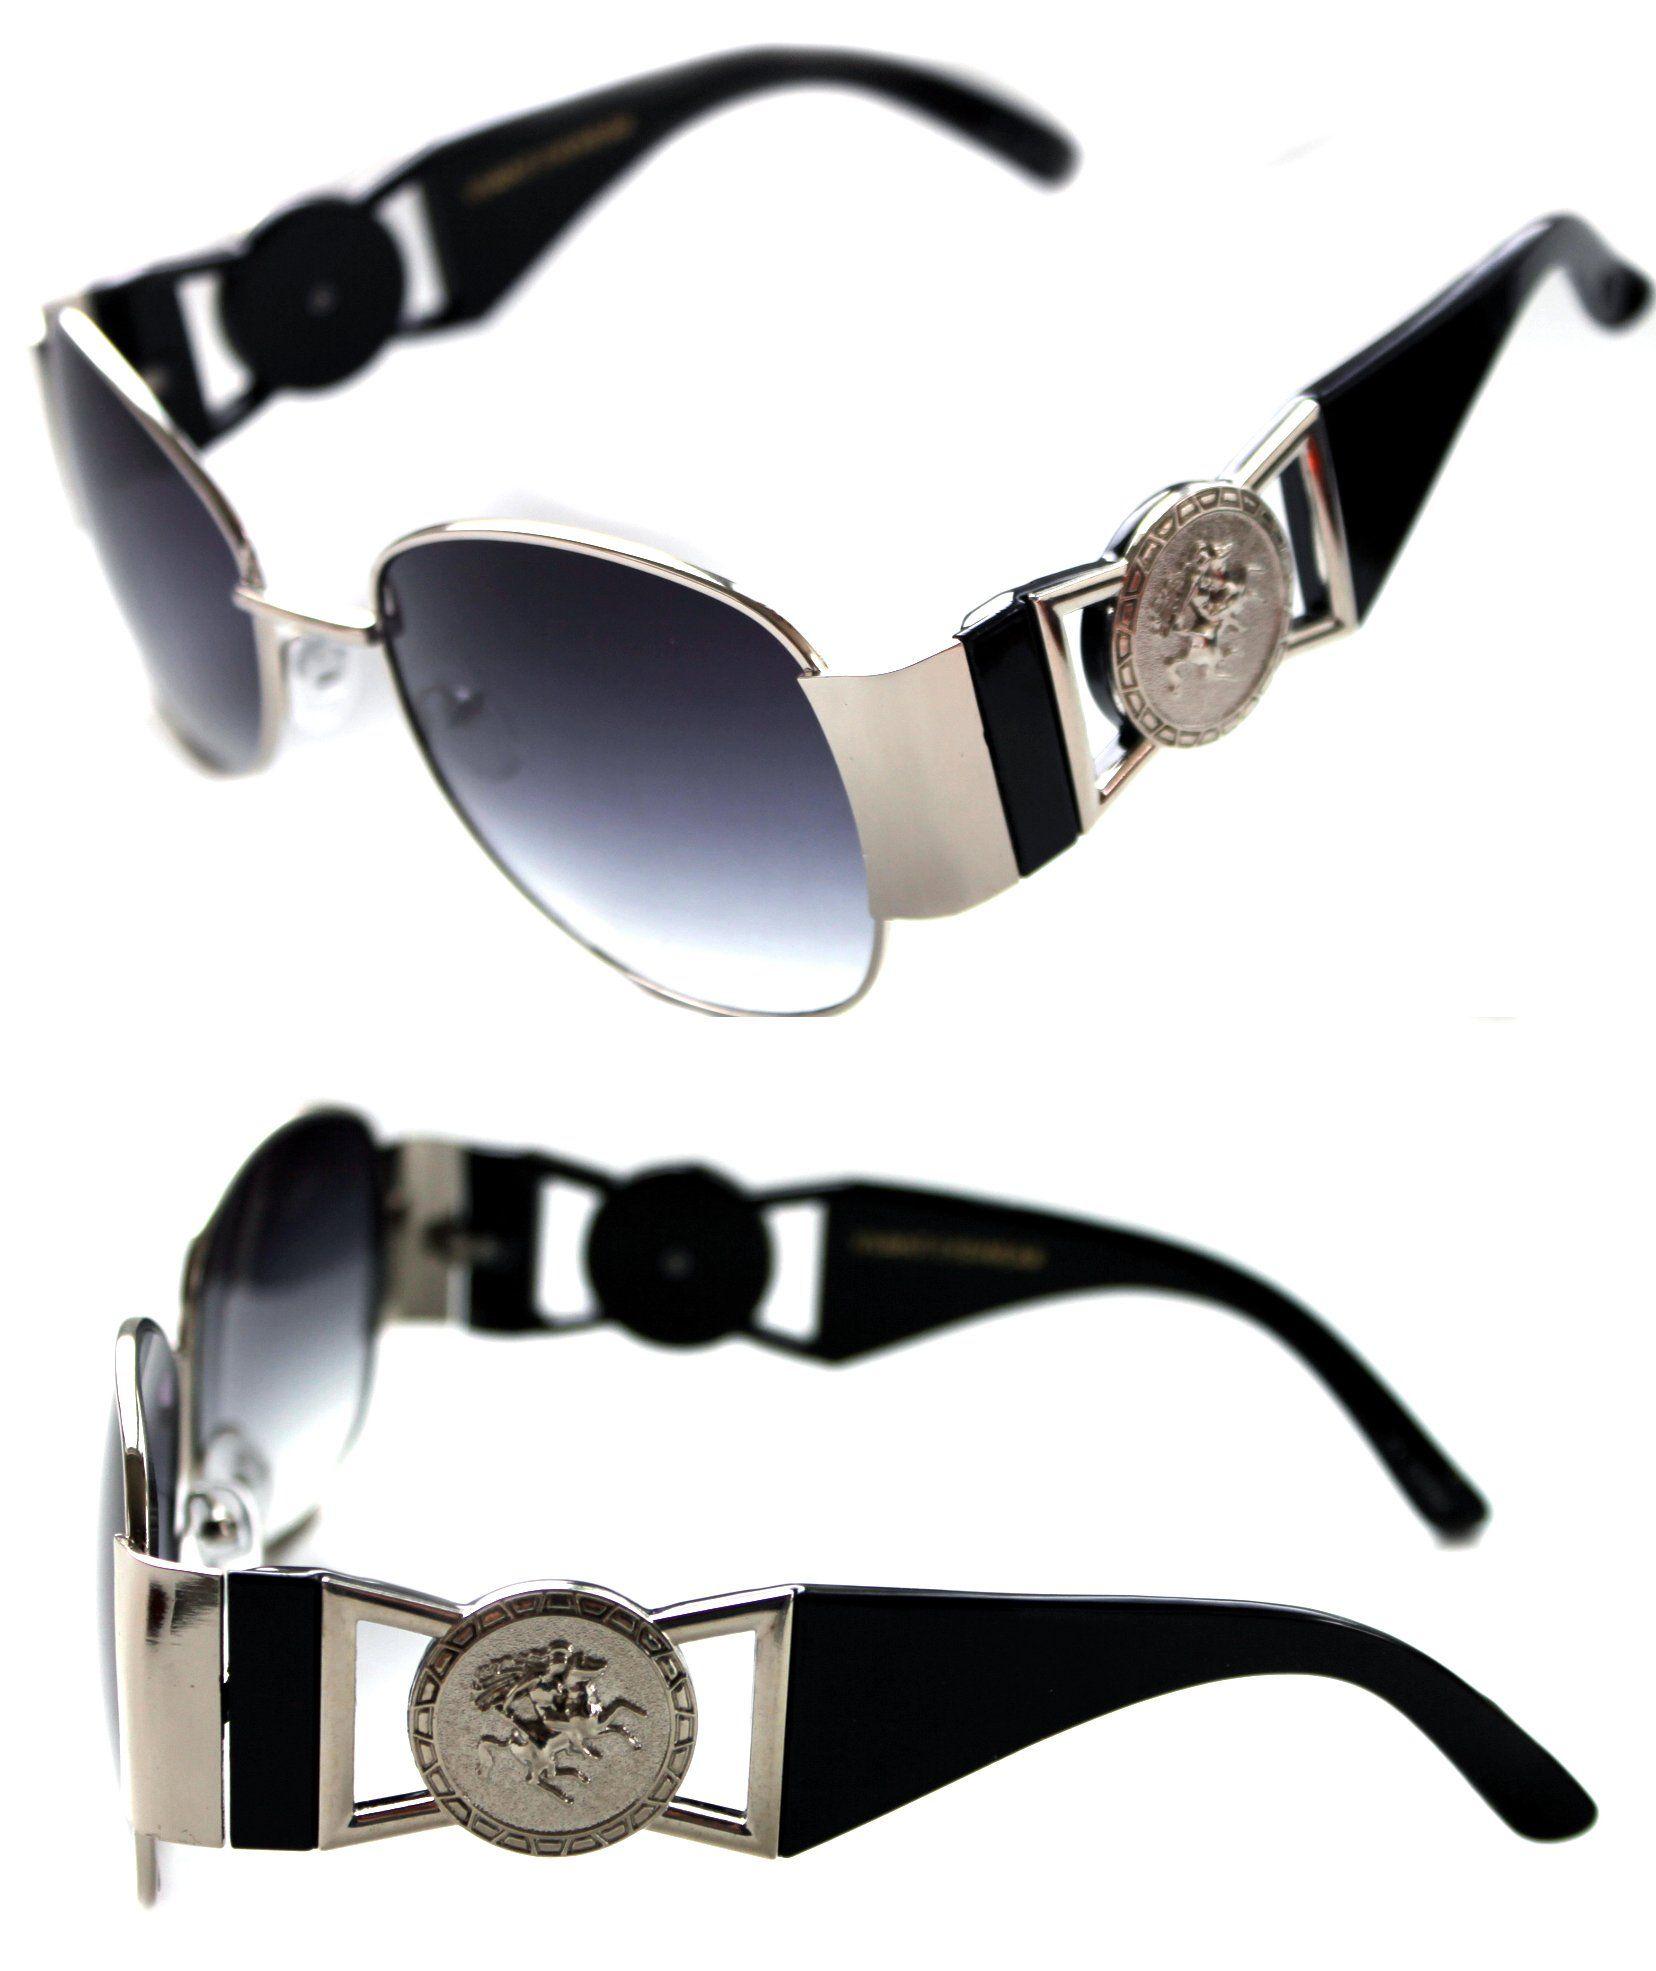 f569e210c03 Medusa Metal Gold Logo Black Silver Aviator Sunglasses Vintage Hip Hop  Rapper